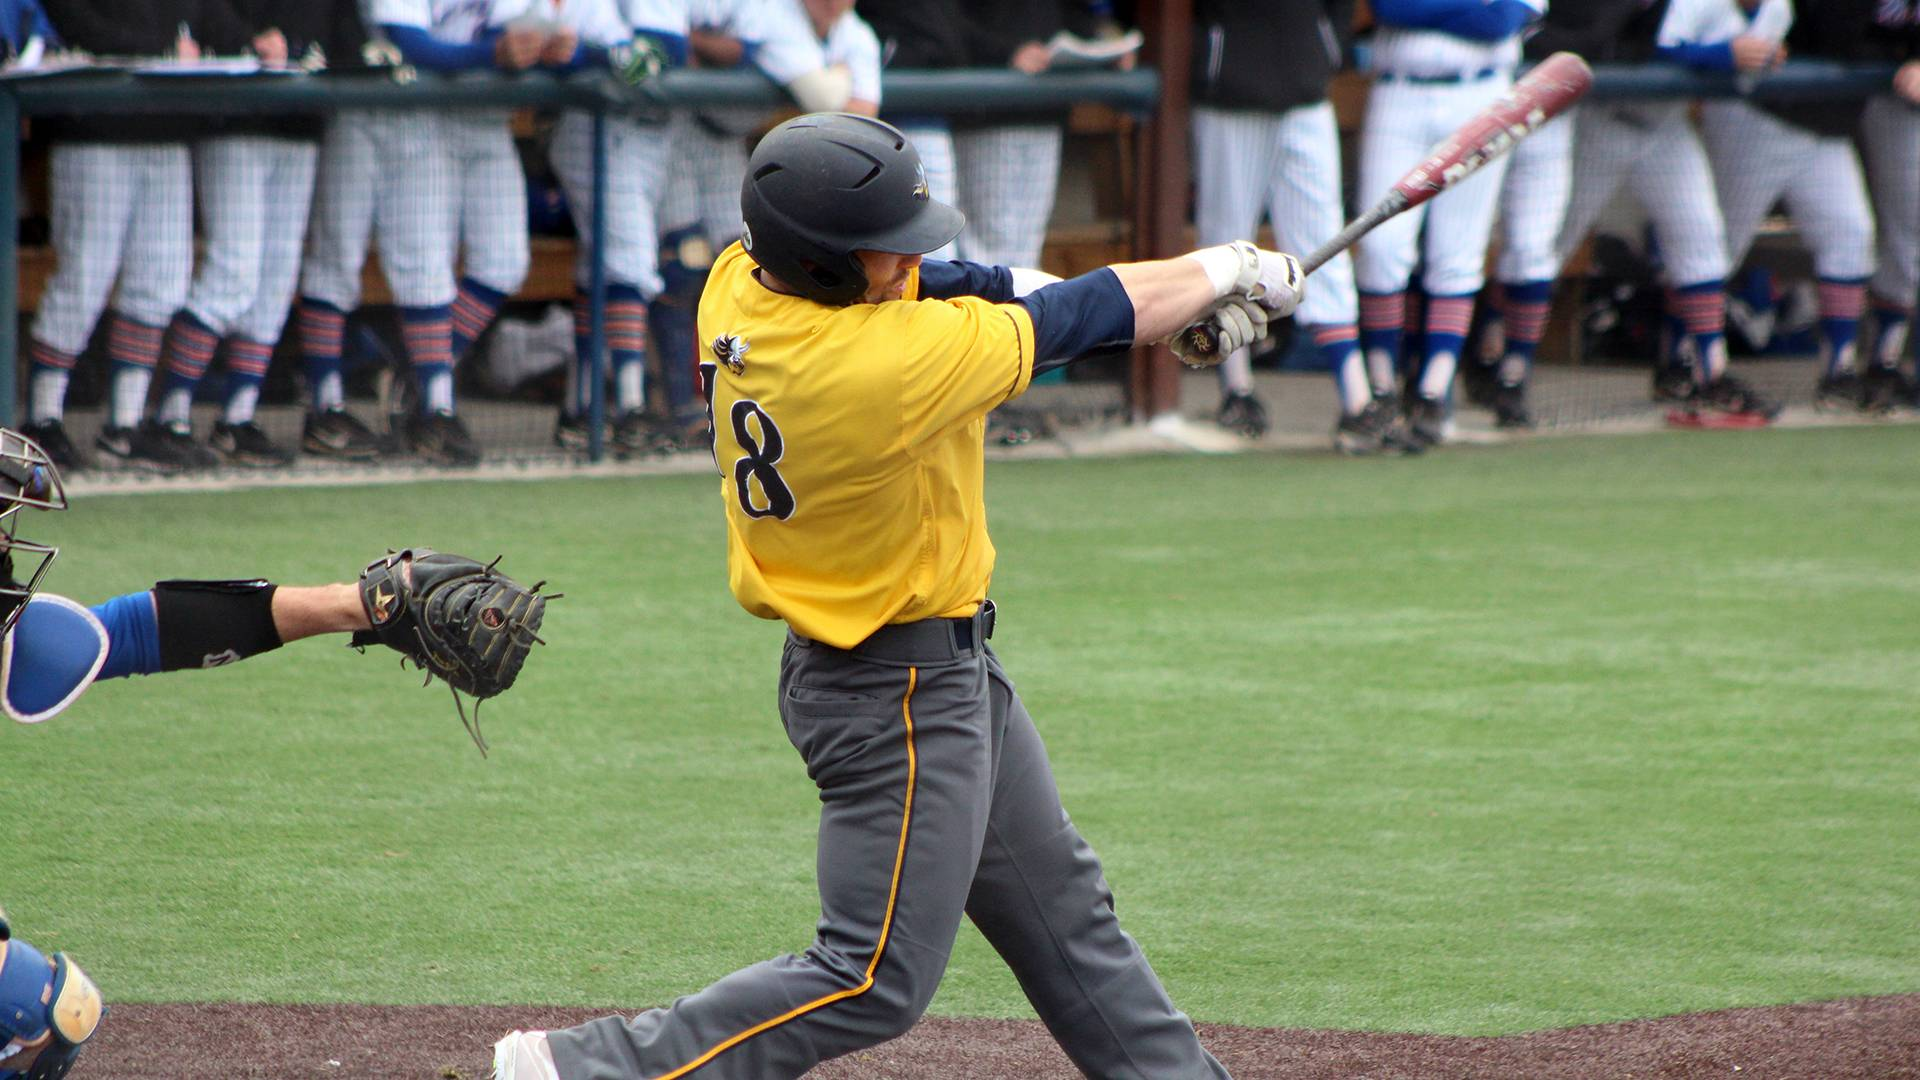 Augustana University Baseball player